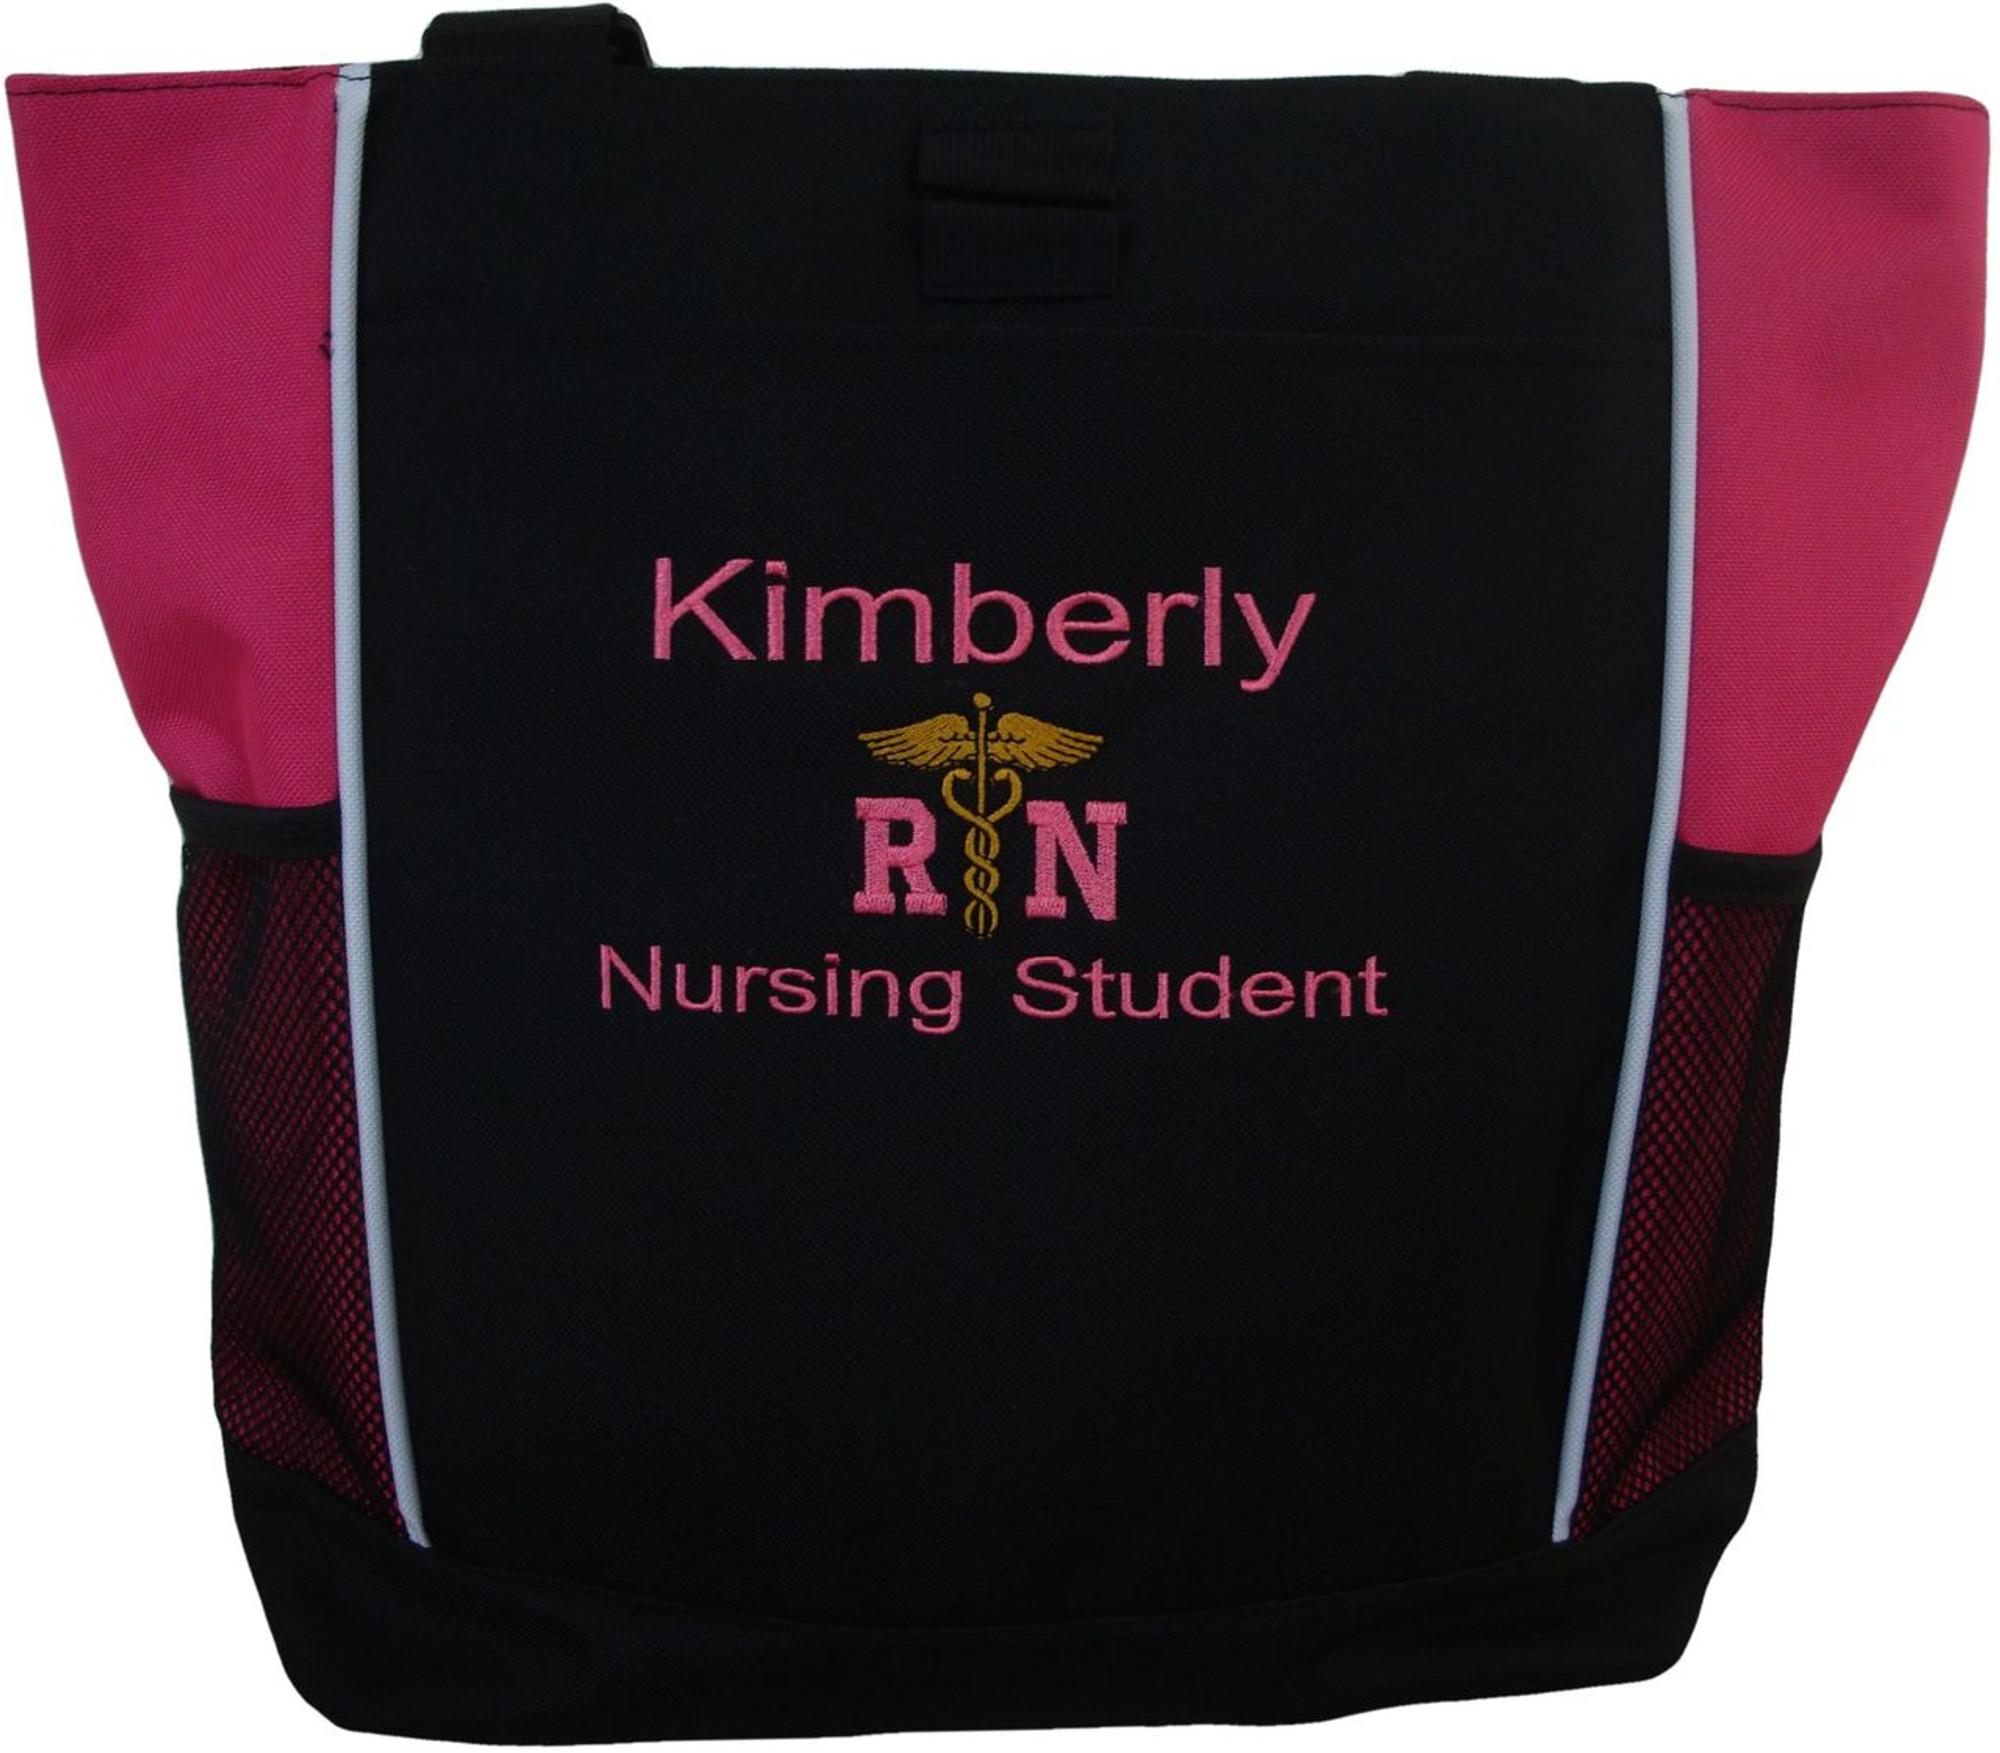 Personalized Nurse Heart Love Backpack Heart Stethoscope Respiratory Therapist Paramedic RN CNA LPN Medic Nursing Student Graduation Gift